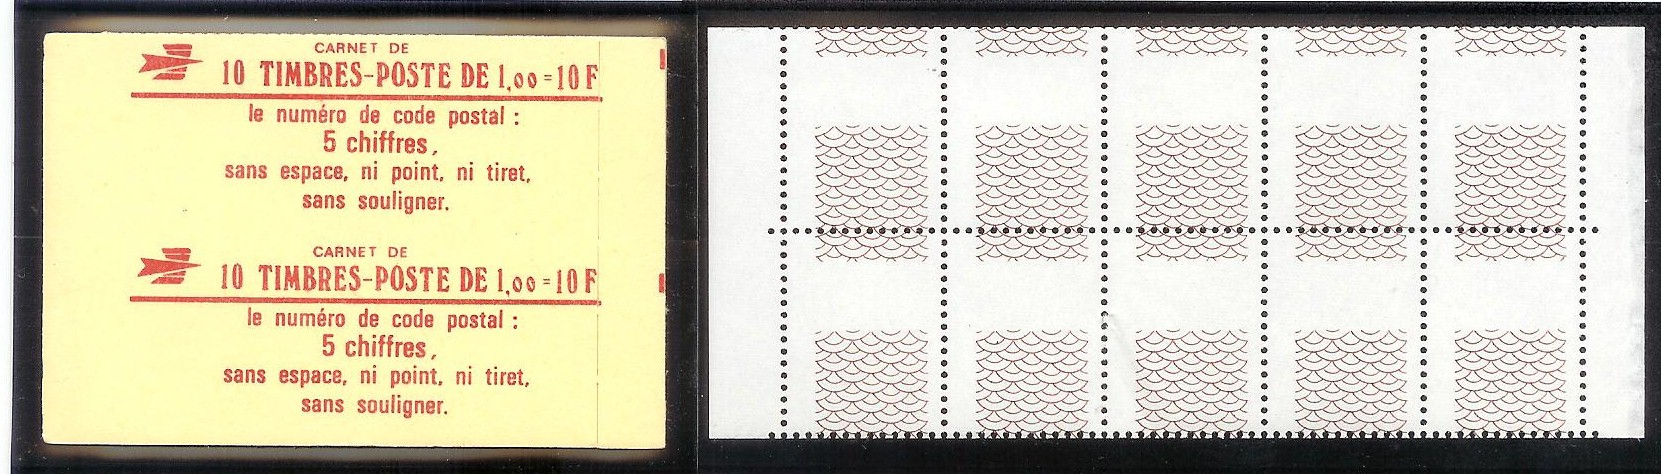 ACCP ES 139A - Guillochis - double carnet de 10 timbres